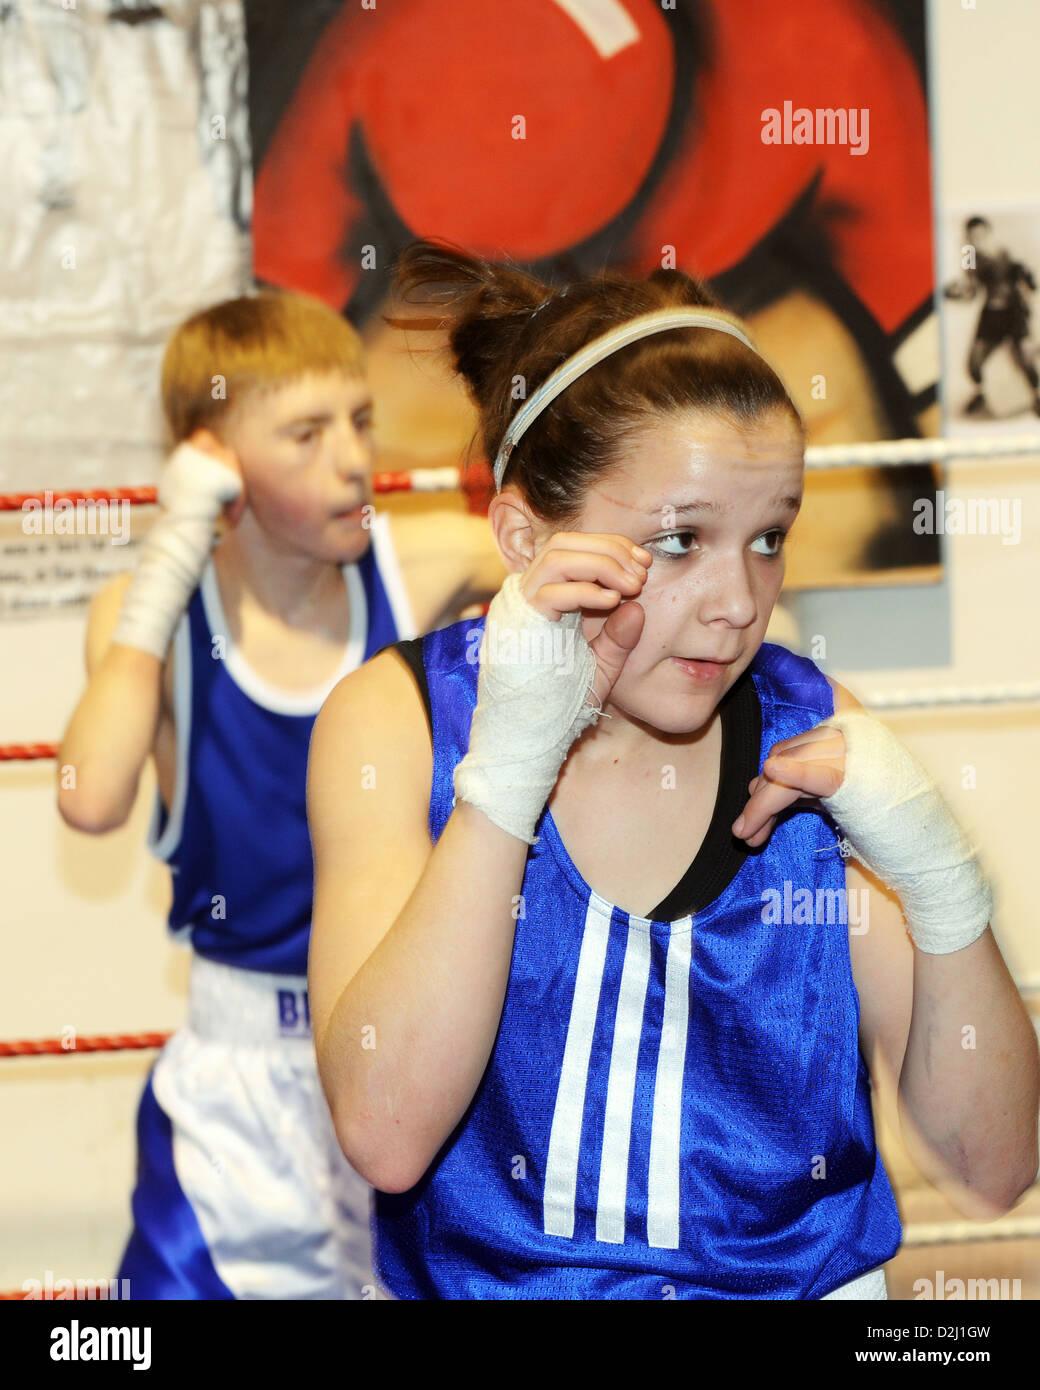 Boxing Club South Yorkshire, Reino Unido Imagen De Stock